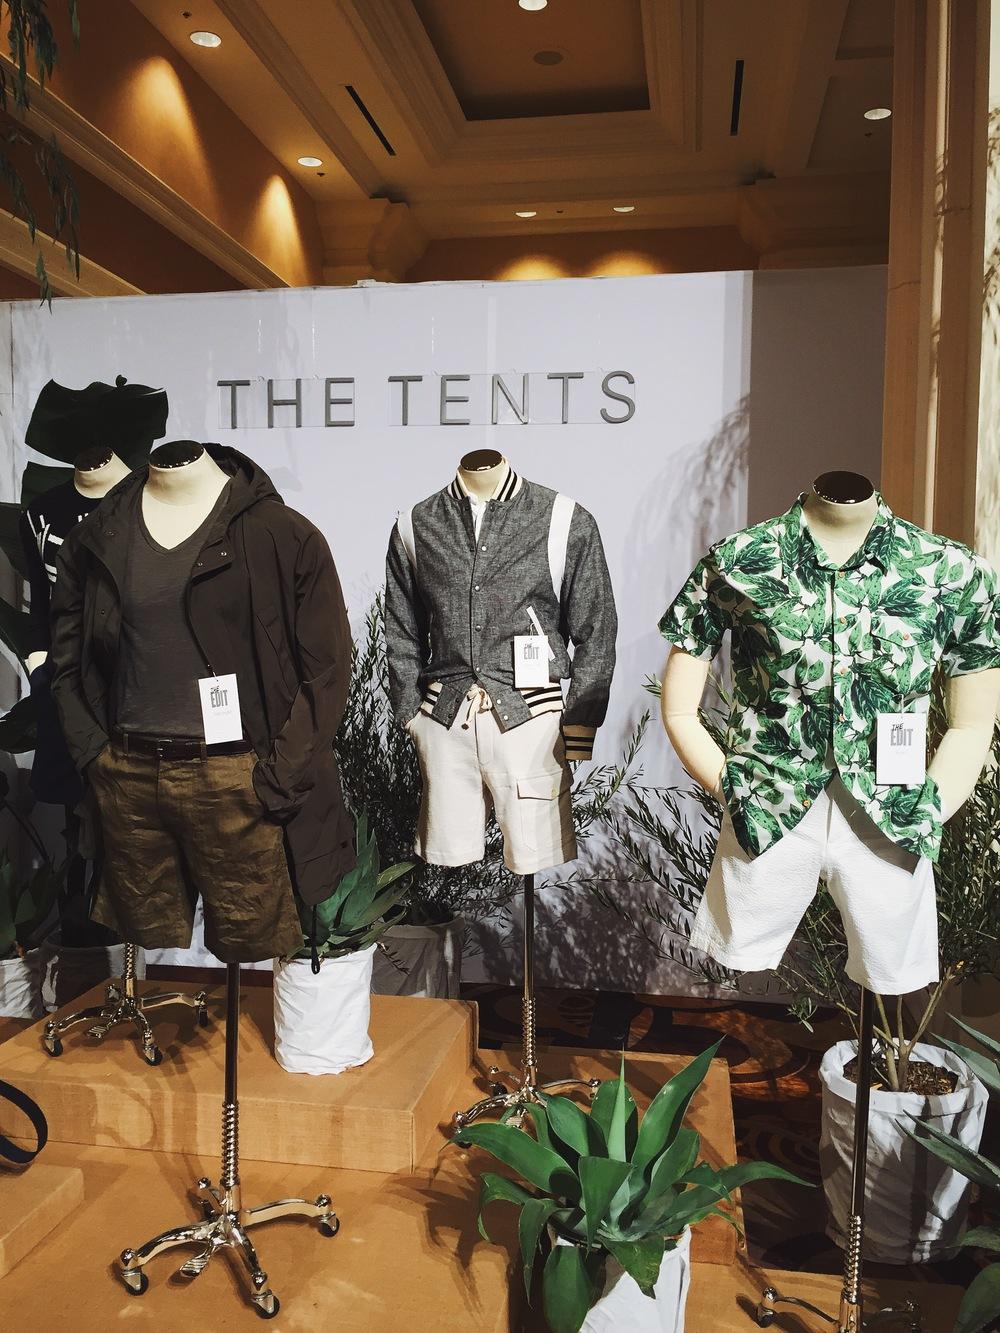 Tents Pic 1.JPG